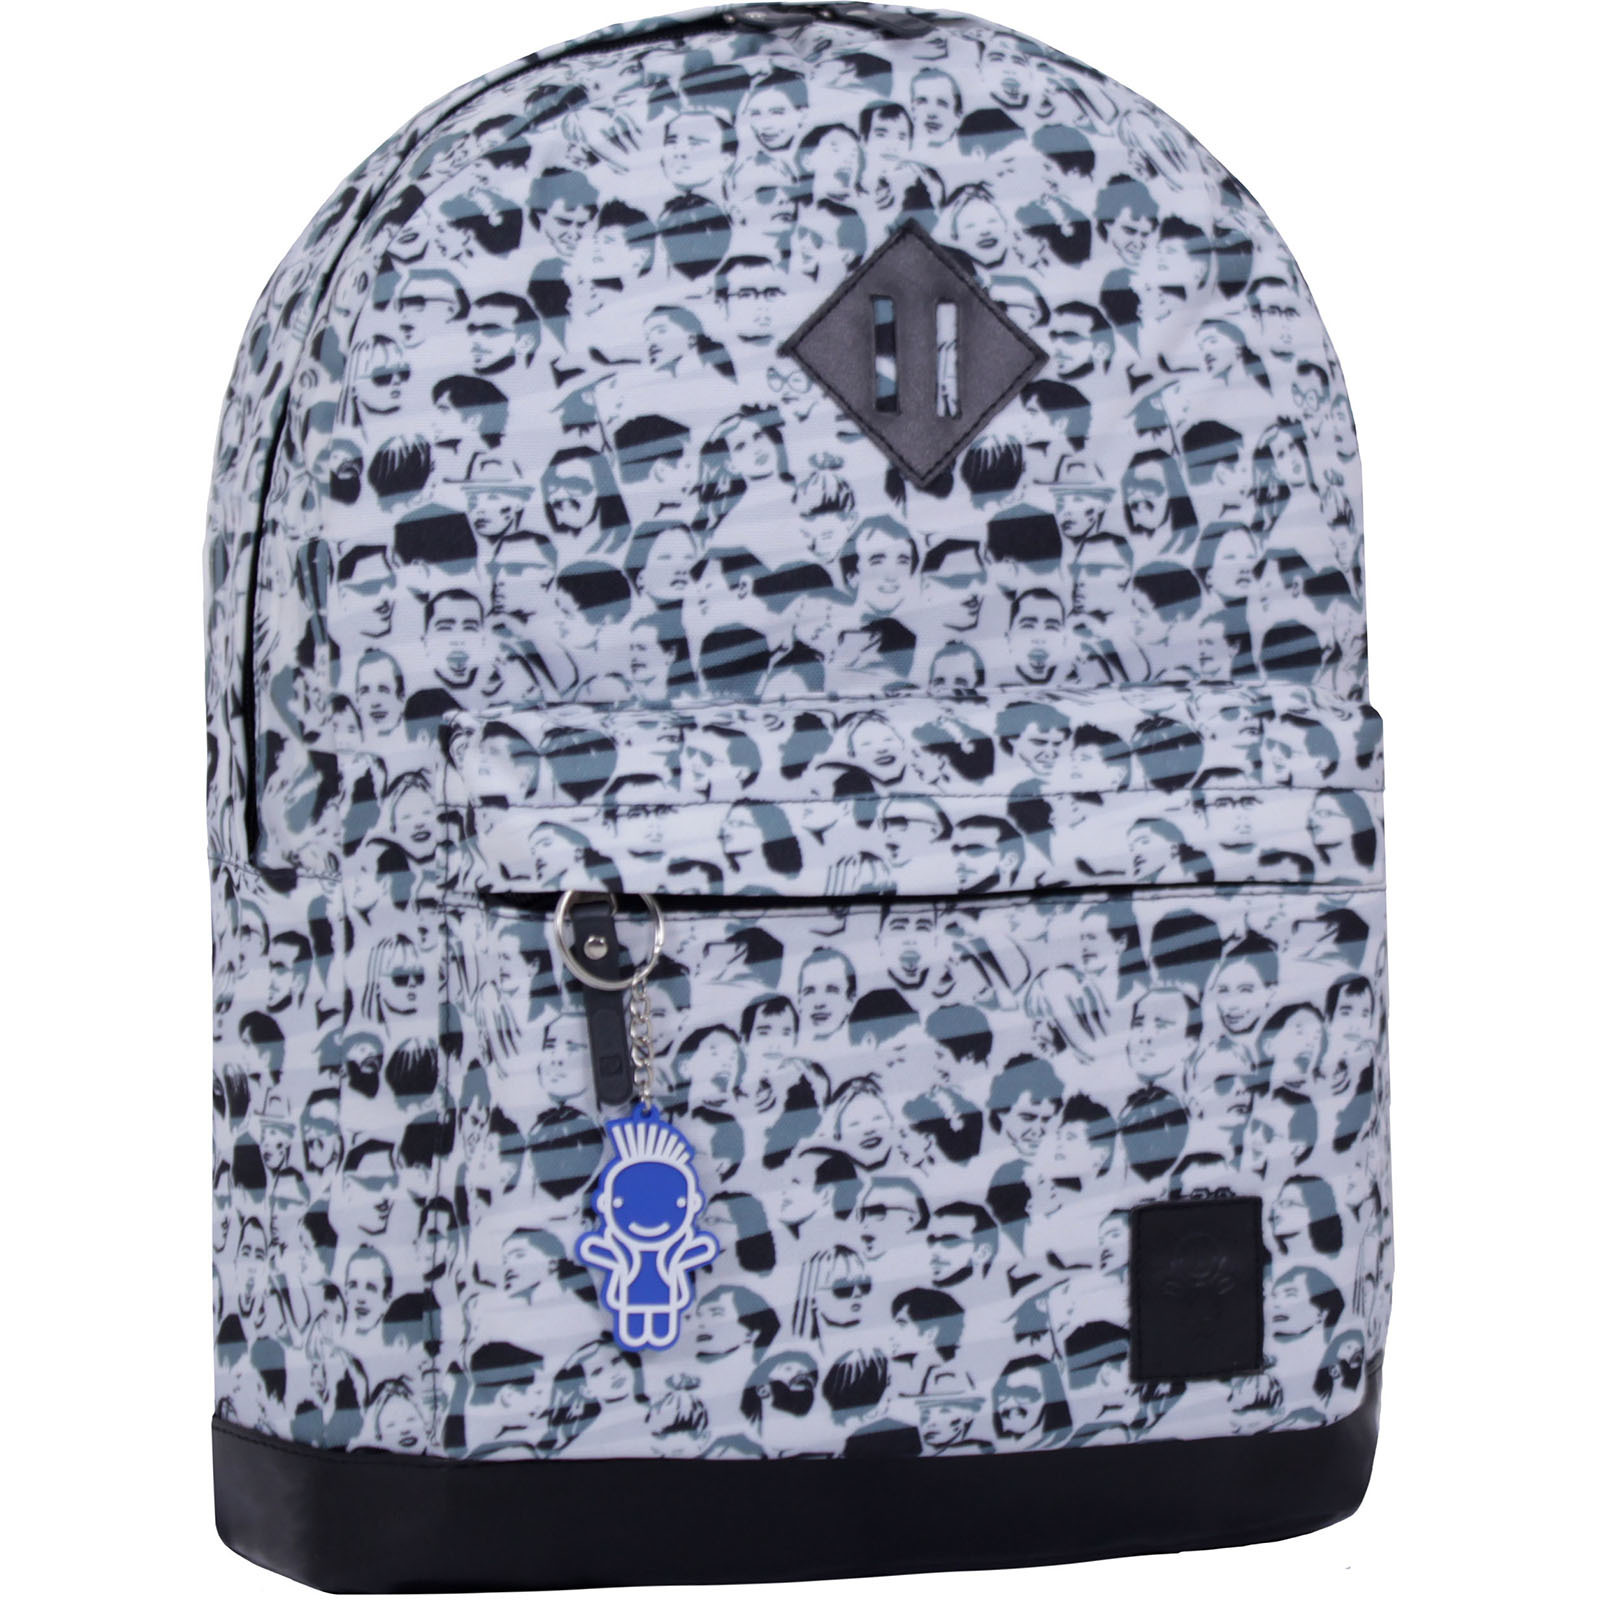 Городские рюкзаки Рюкзак Bagland Молодежный 17 л. сублимация (лица) (005336640) IMG_1750.JPG